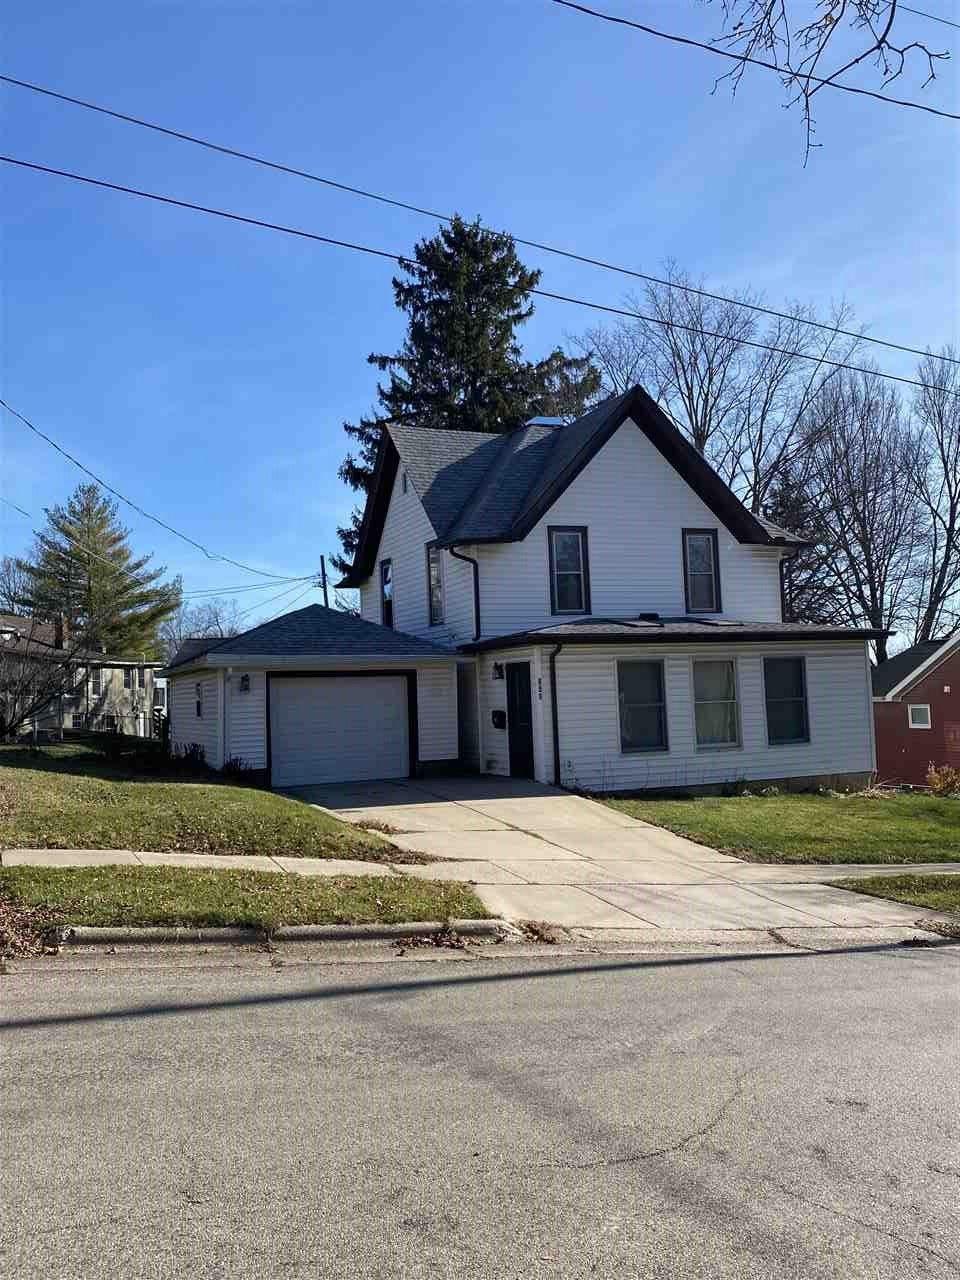 108 S Iowa, Mineral Point, WI 53565 - #: 1898138